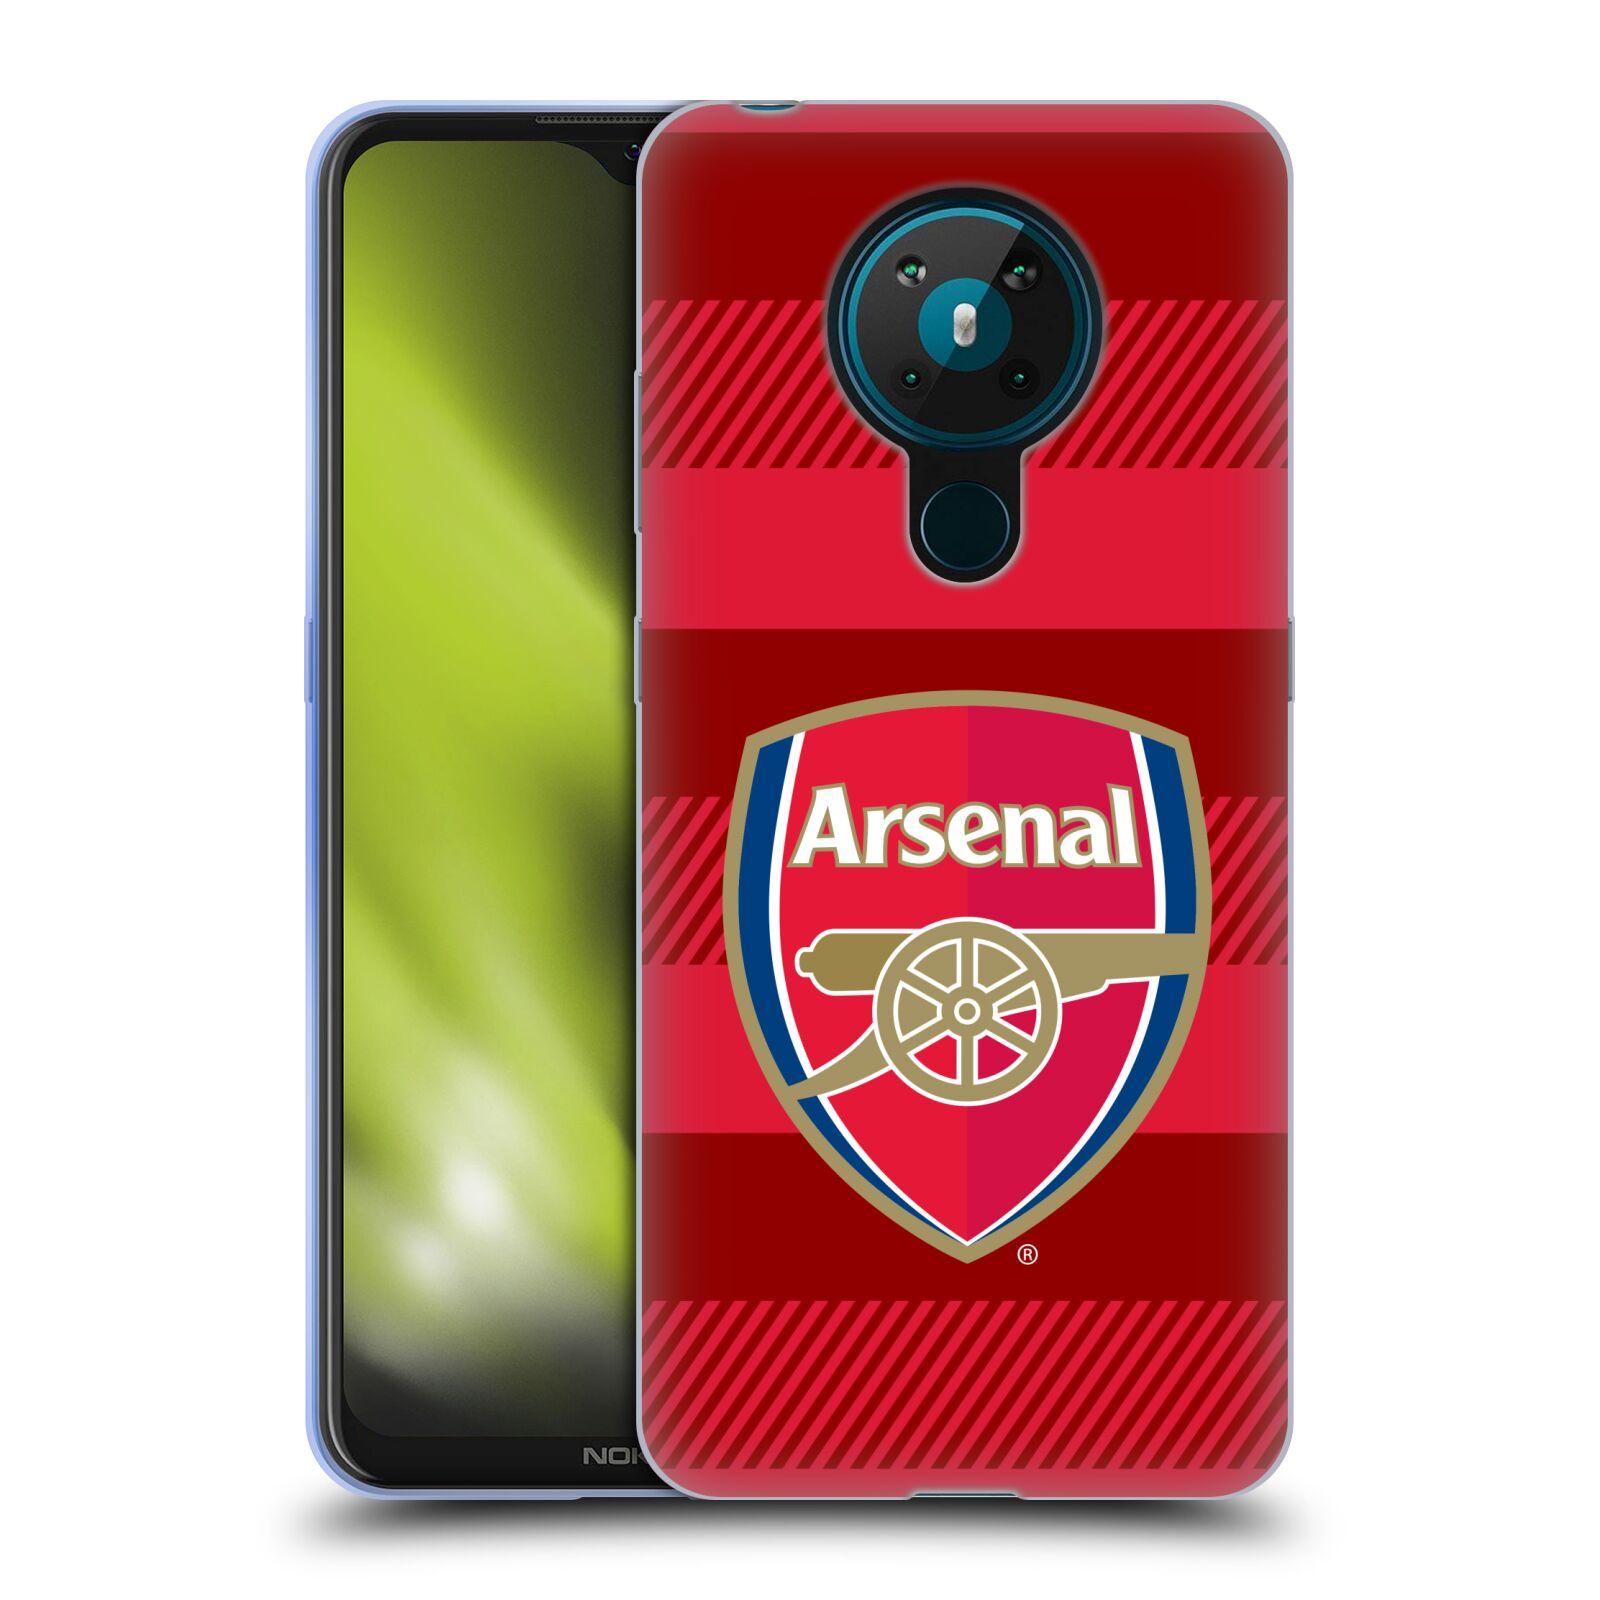 Silikonové pouzdro na mobil Nokia 5.3 - Head Case - Arsenal FC - Logo s pruhy